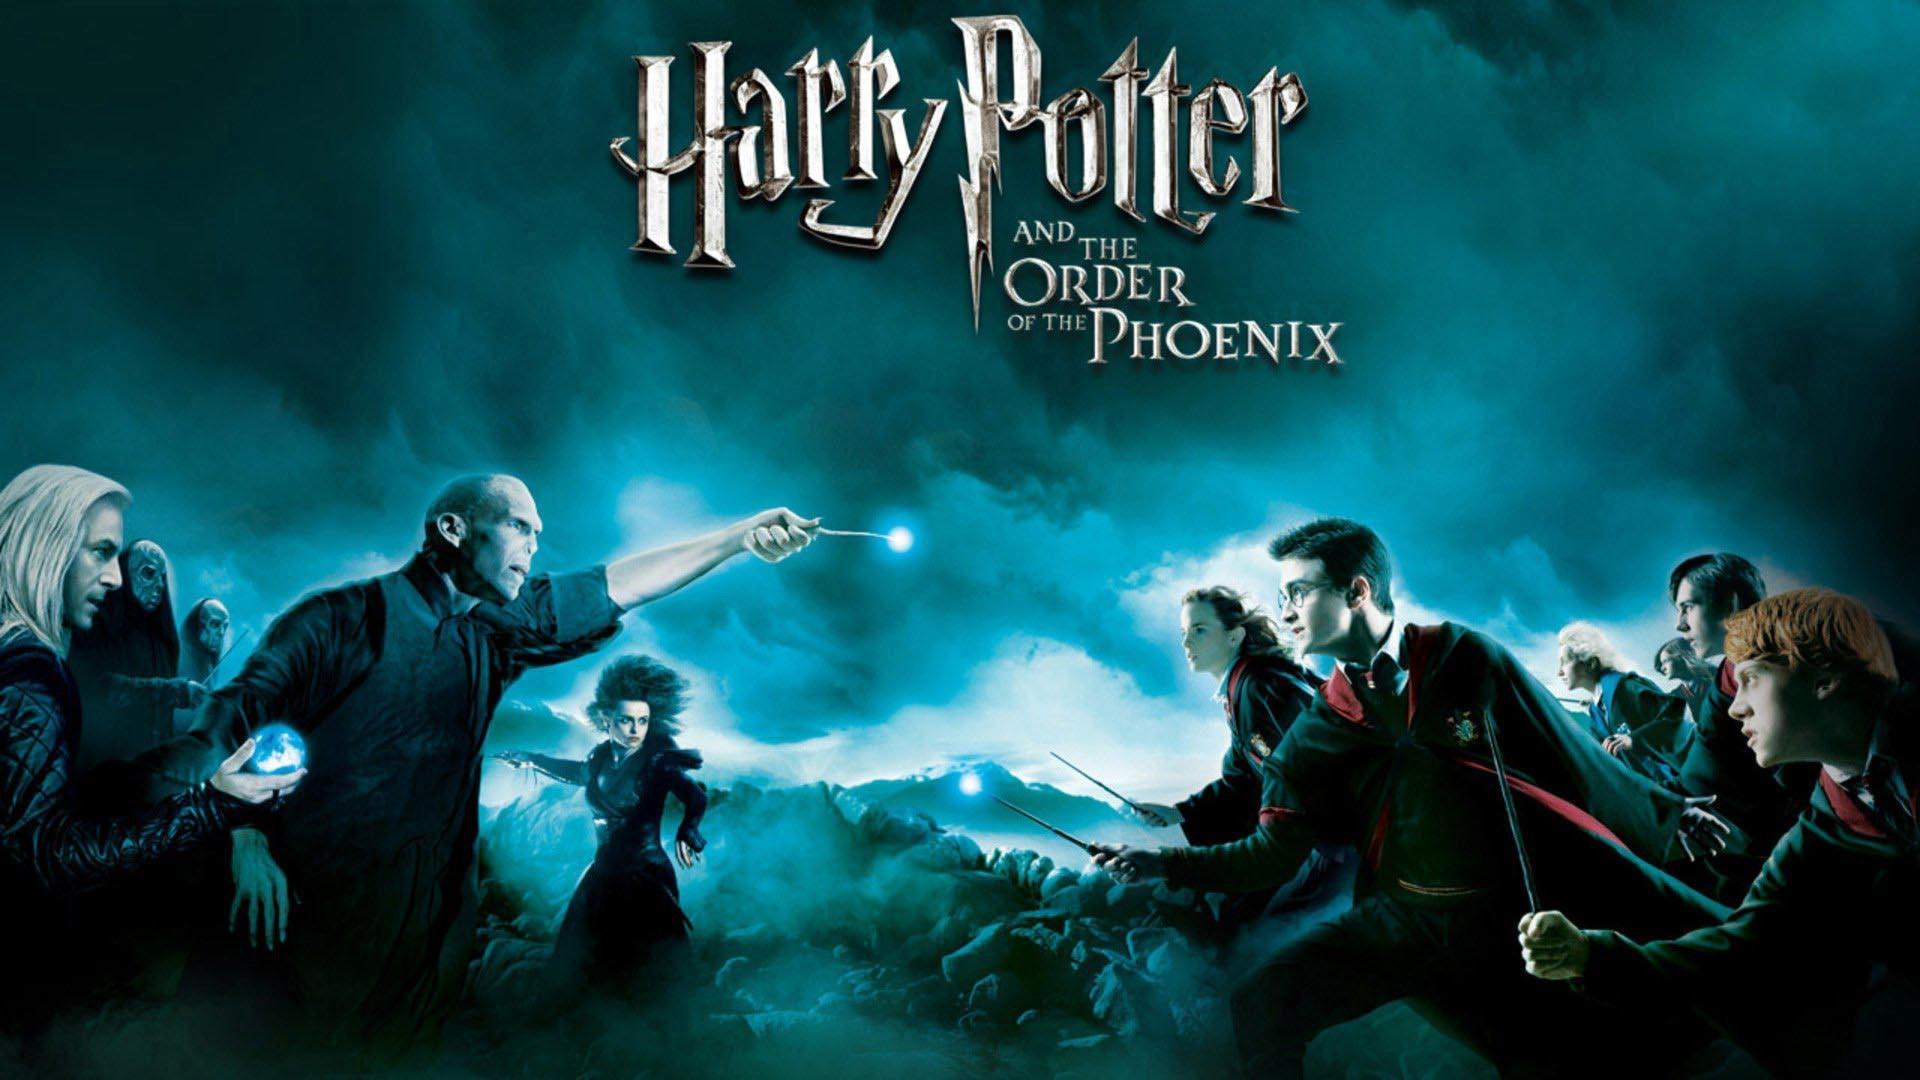 Harry Potter 5 wallpaper